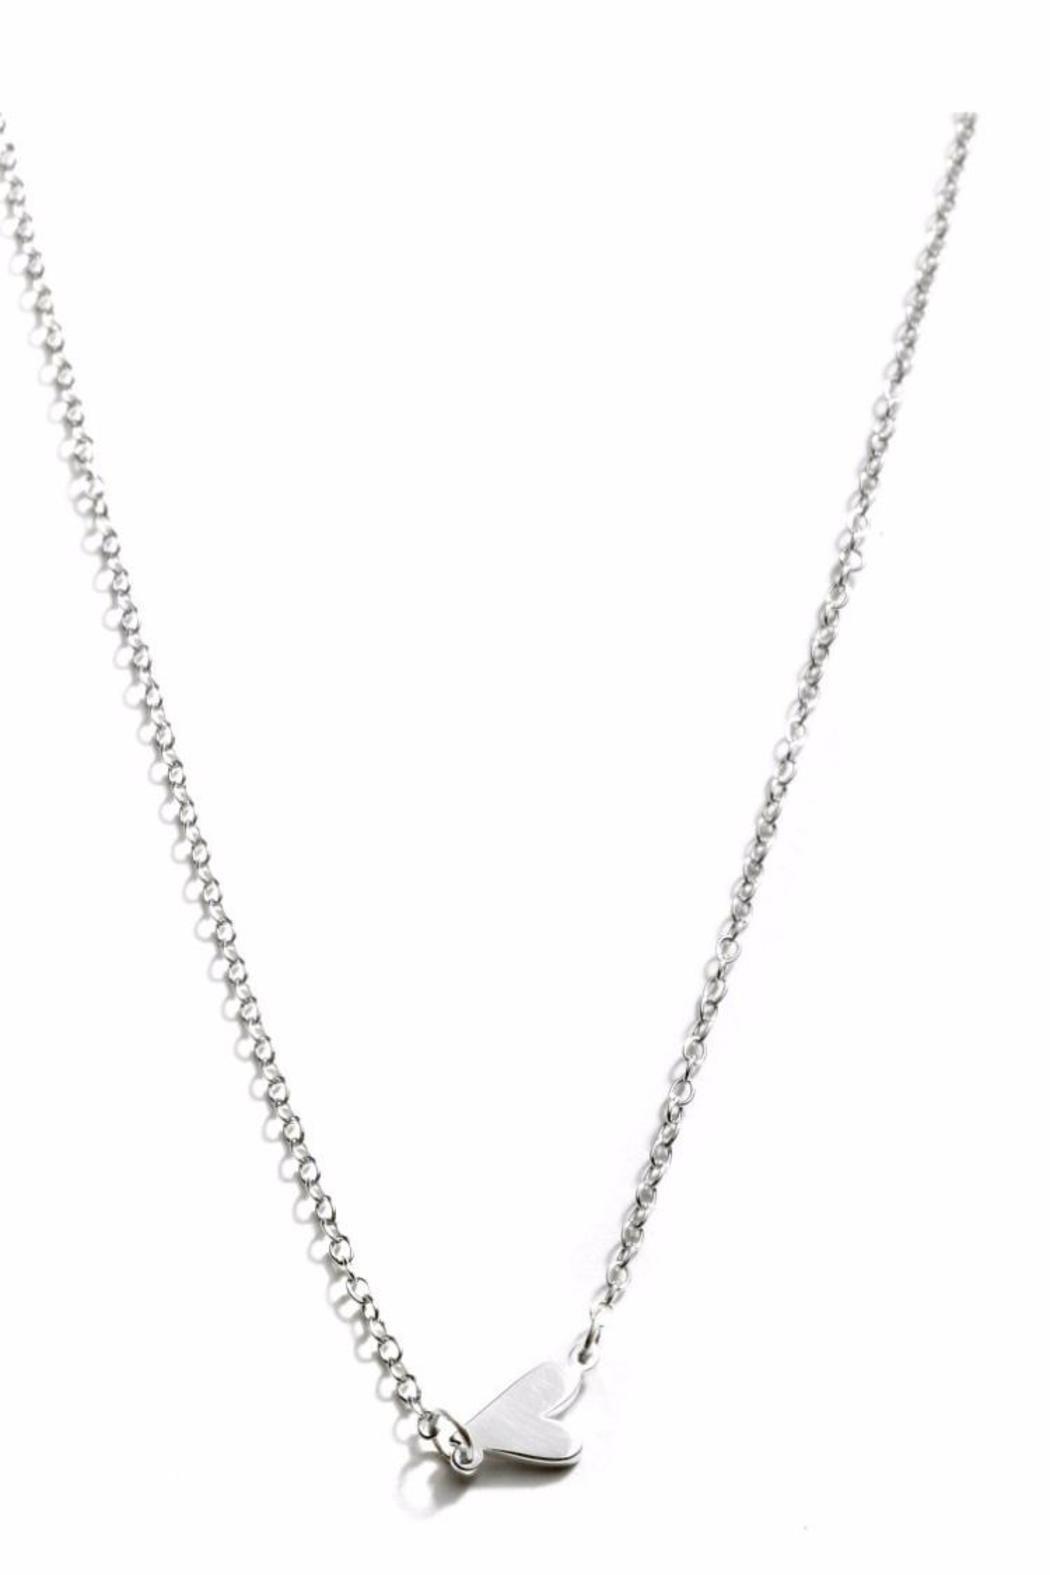 Assya Silver Heart Necklace of Length 22cm IDV7np7Asv